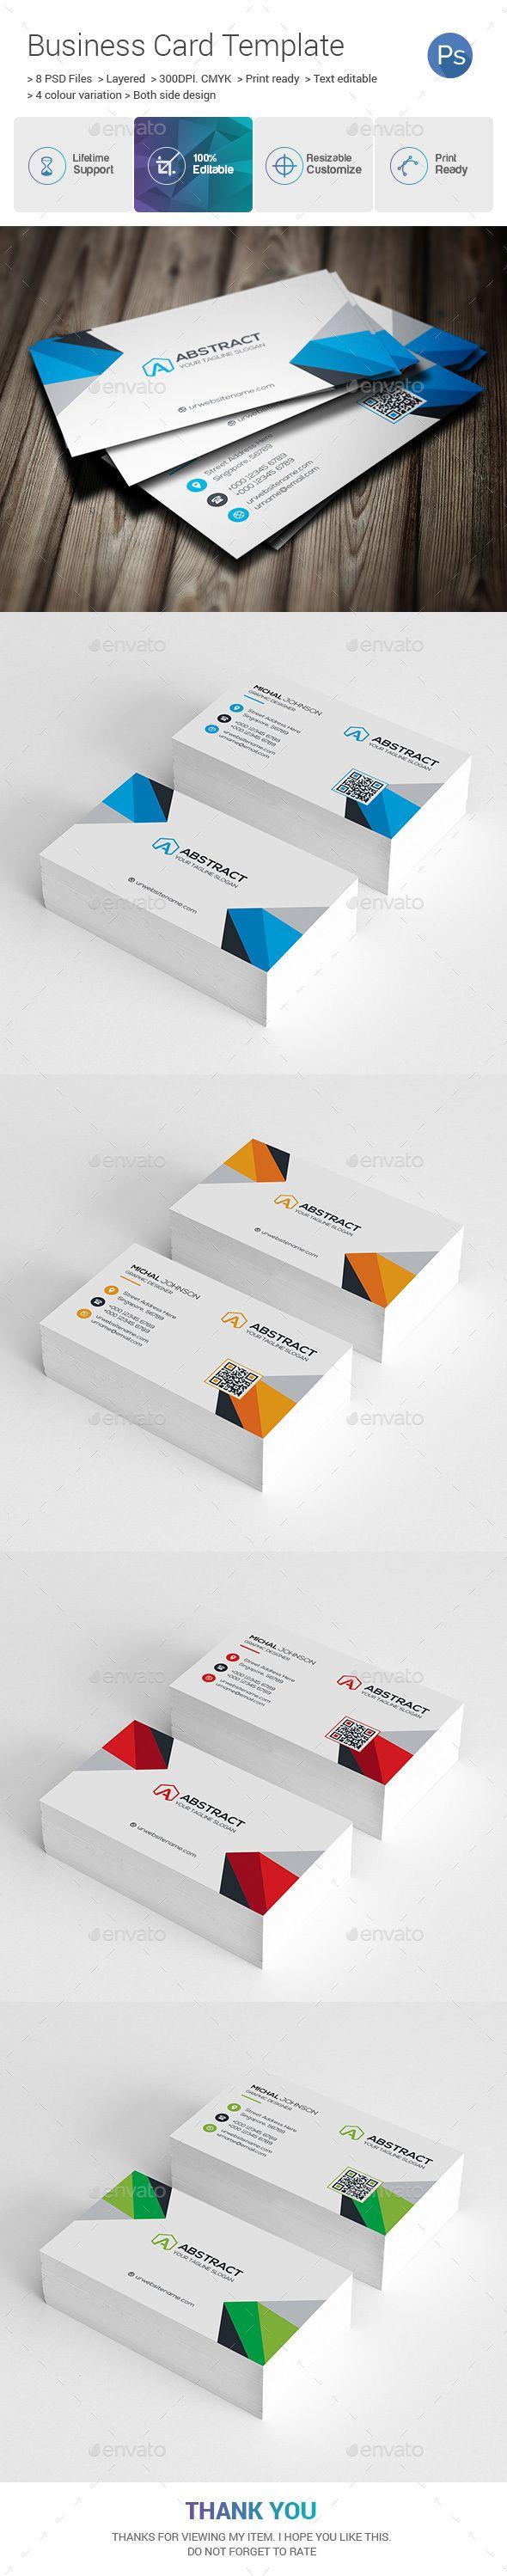 84 Best Business Card Images On Pinterest Business Card Design